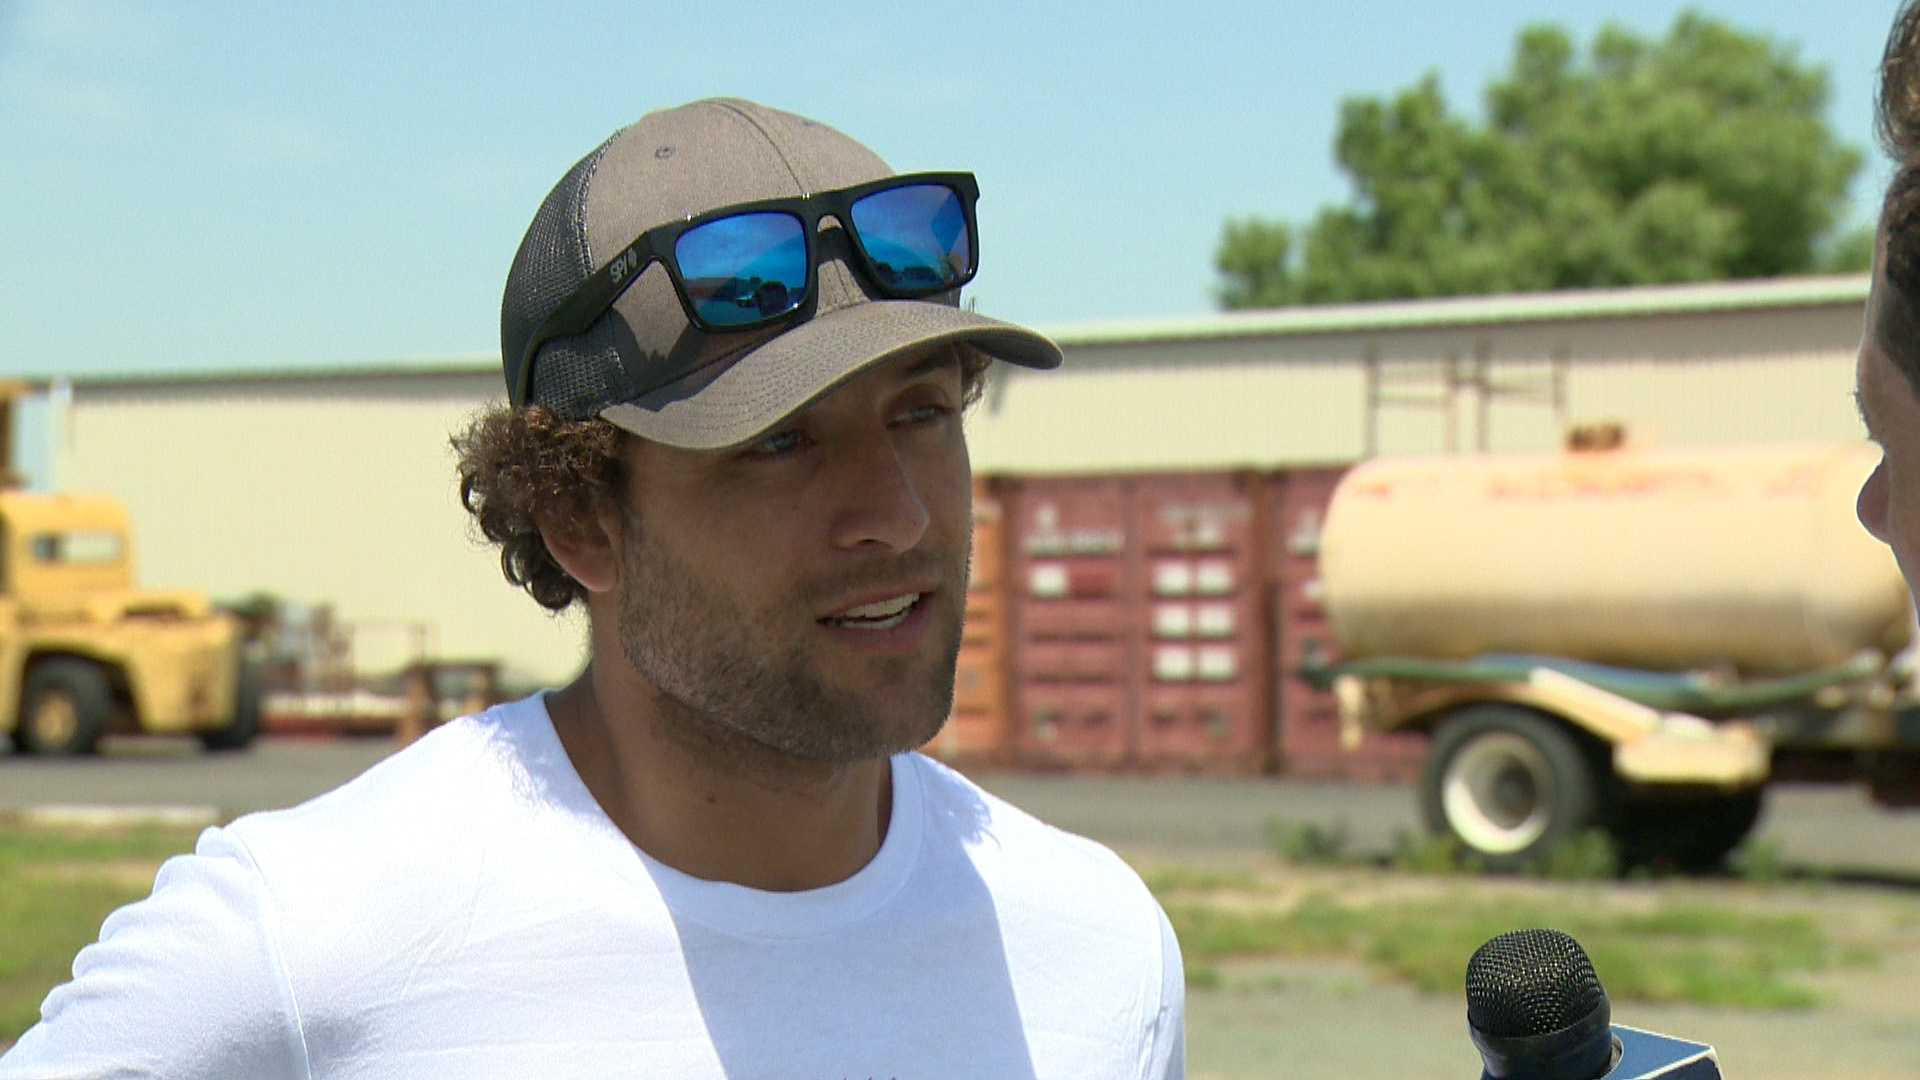 Sebastian Alvarez was on board a skydiving plane that crashed Thursday in San Joaquin County.